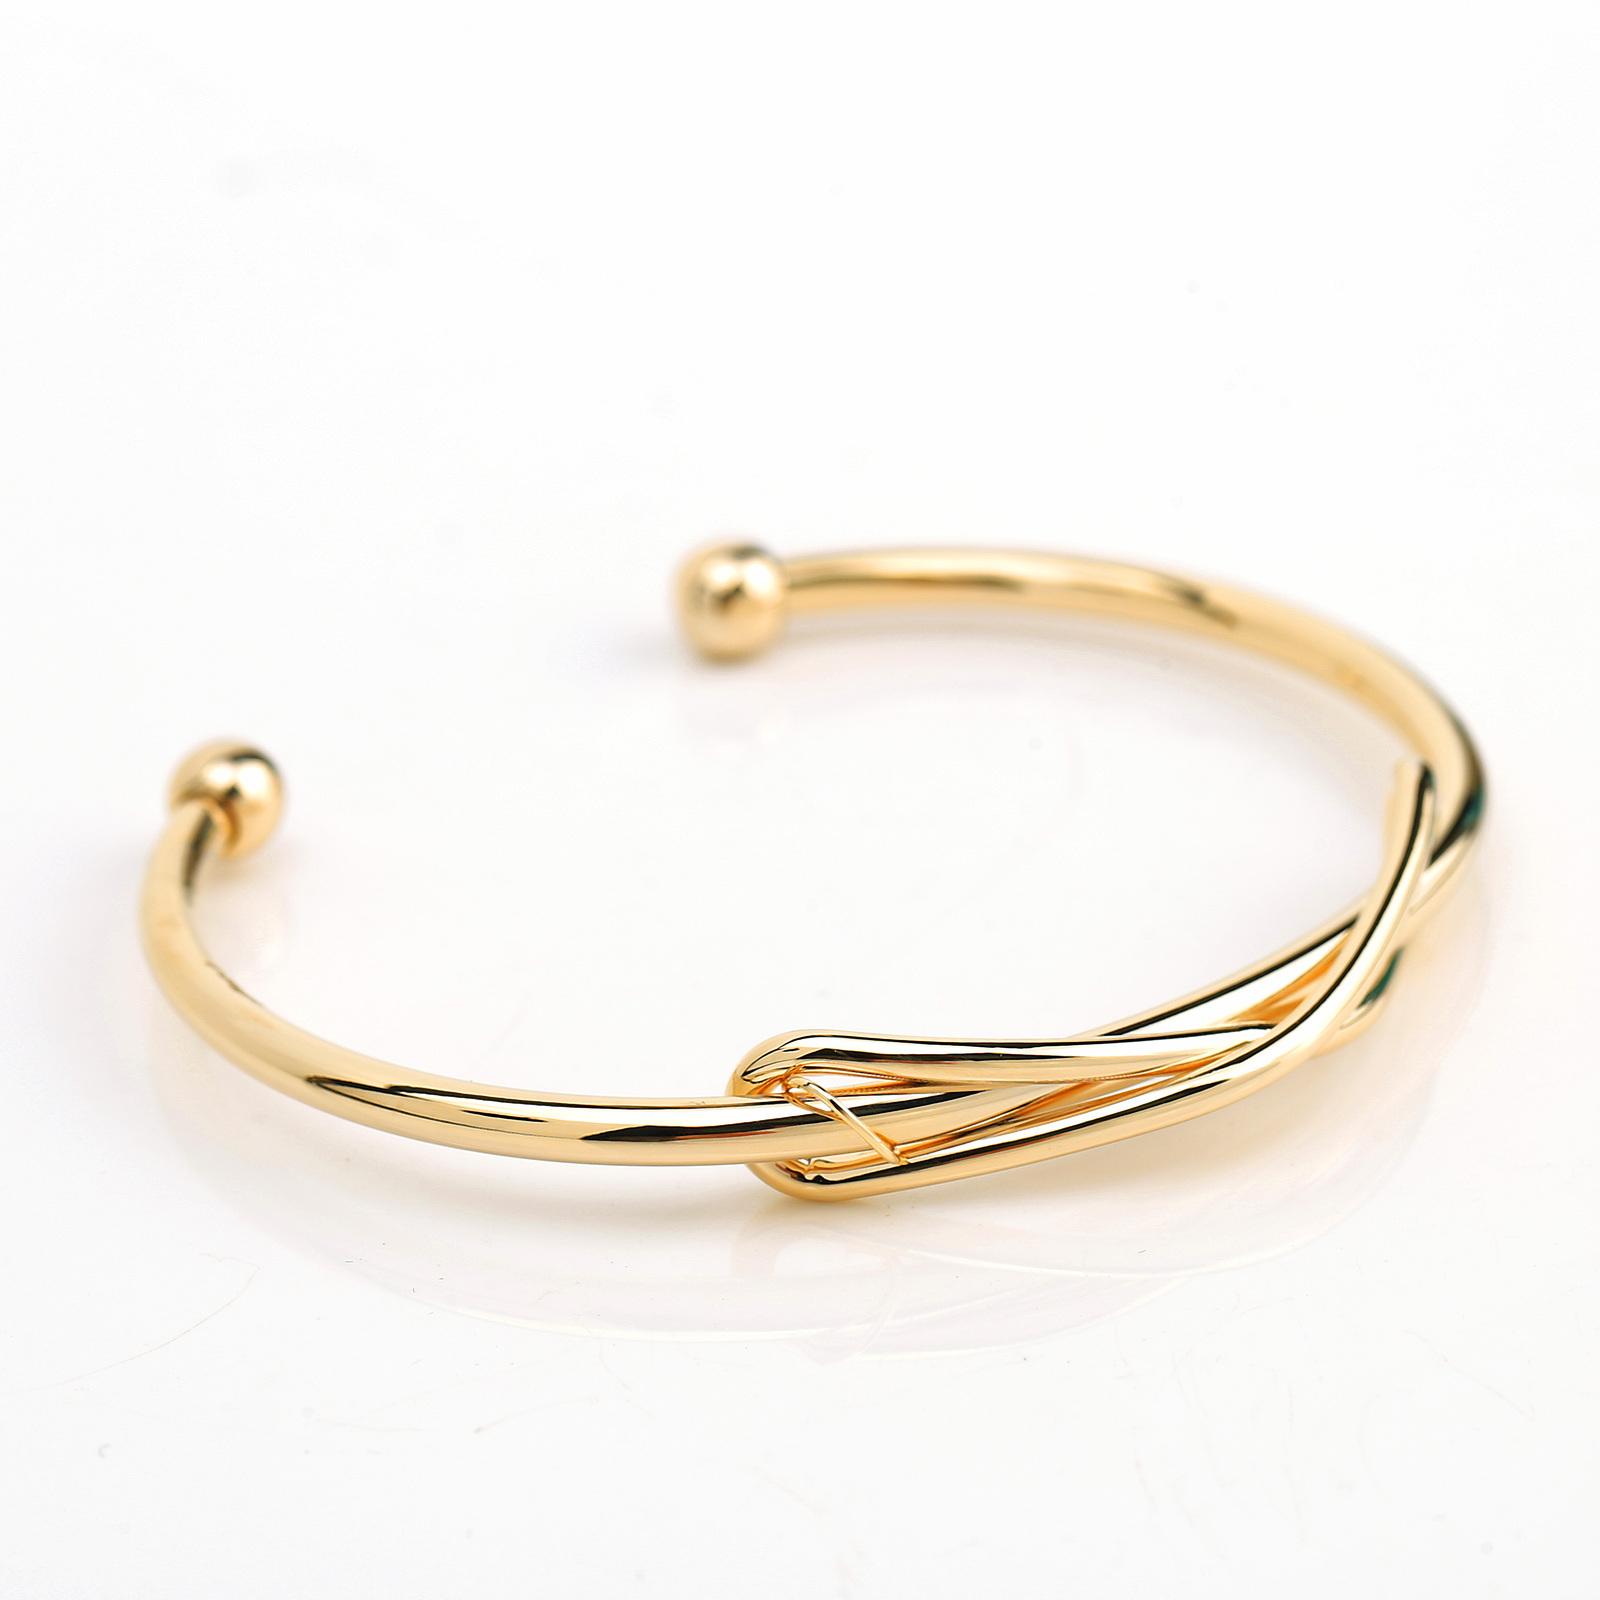 UE- Trendy Gold Tone Designer Bangle Bracelet With Contemporary Infinity Design